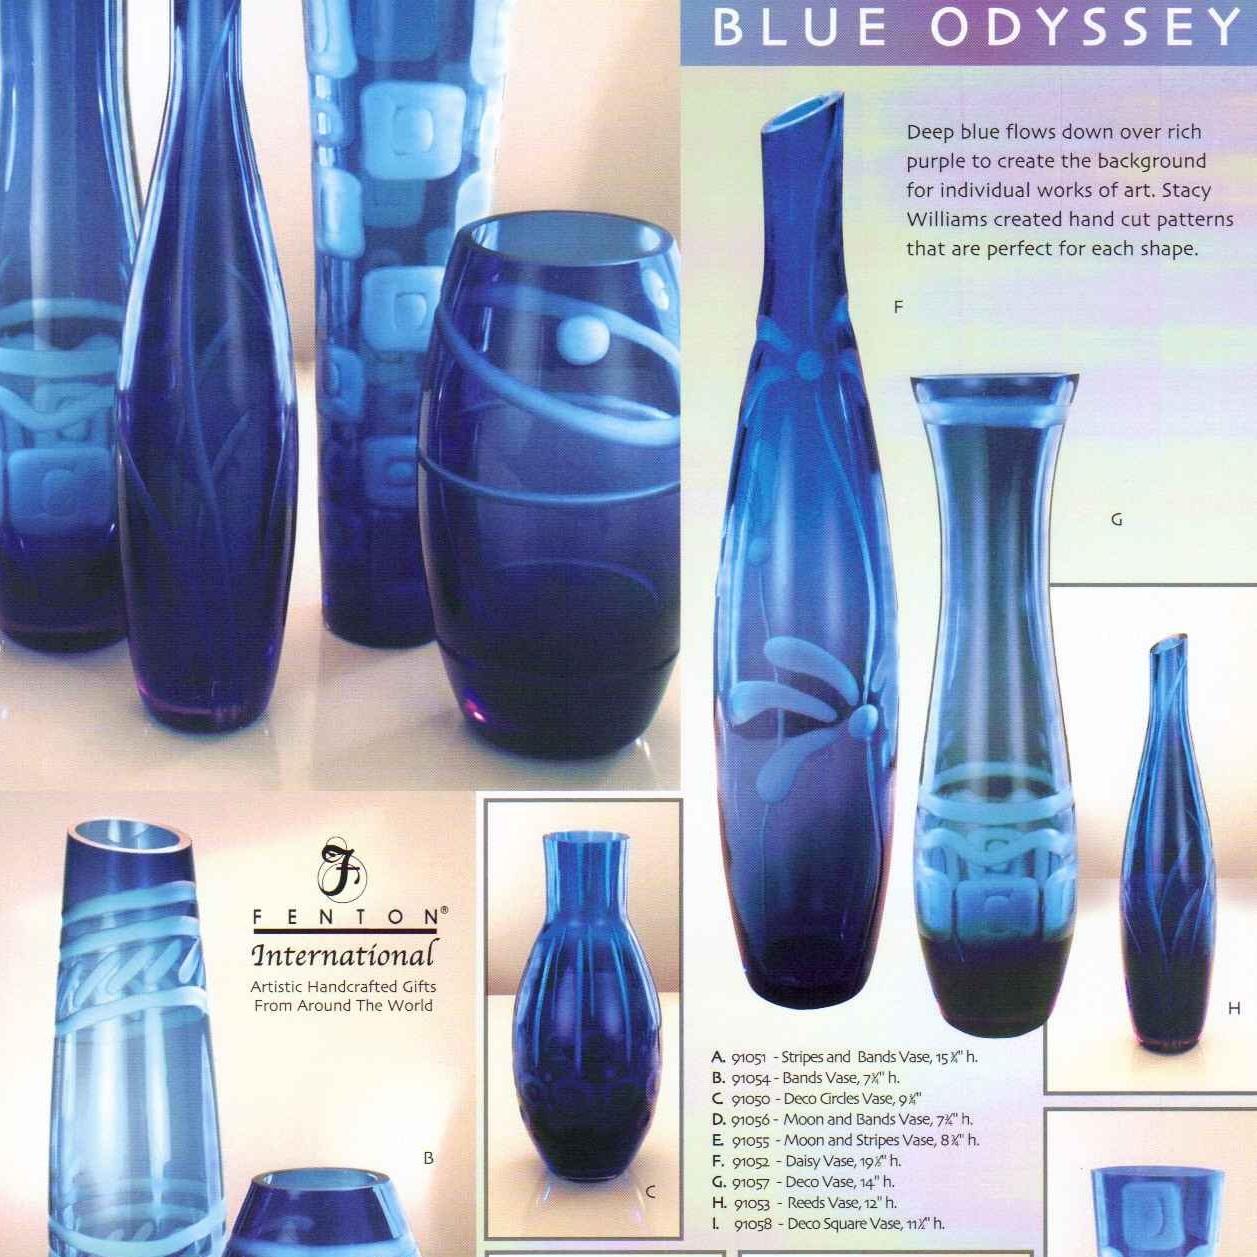 2009 Blue Odyssey